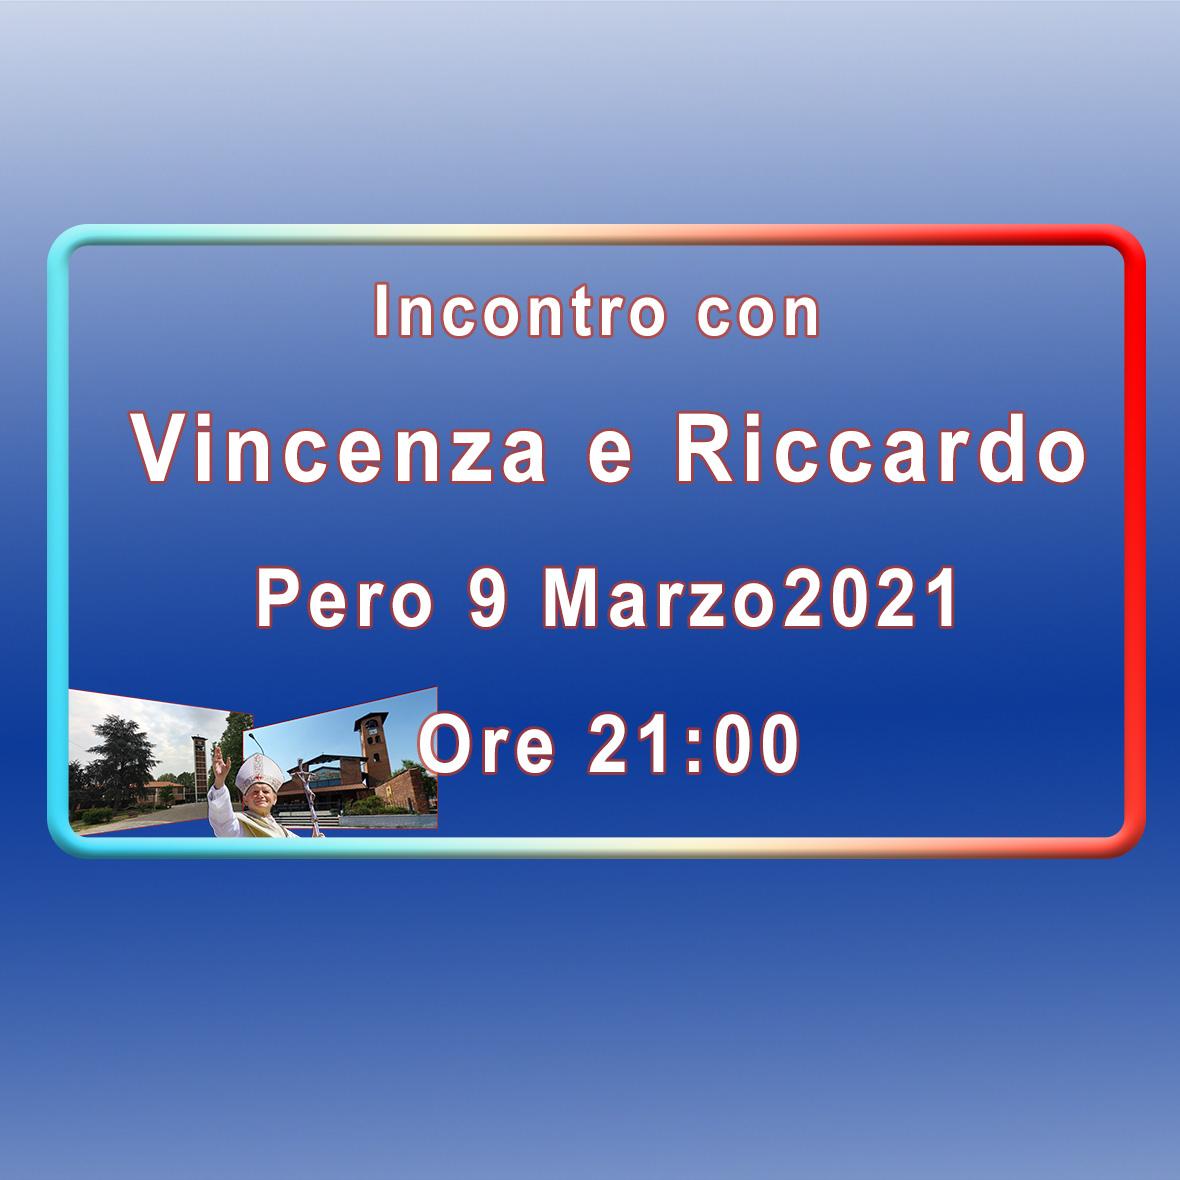 Incontro con Vincenza e Riccardo